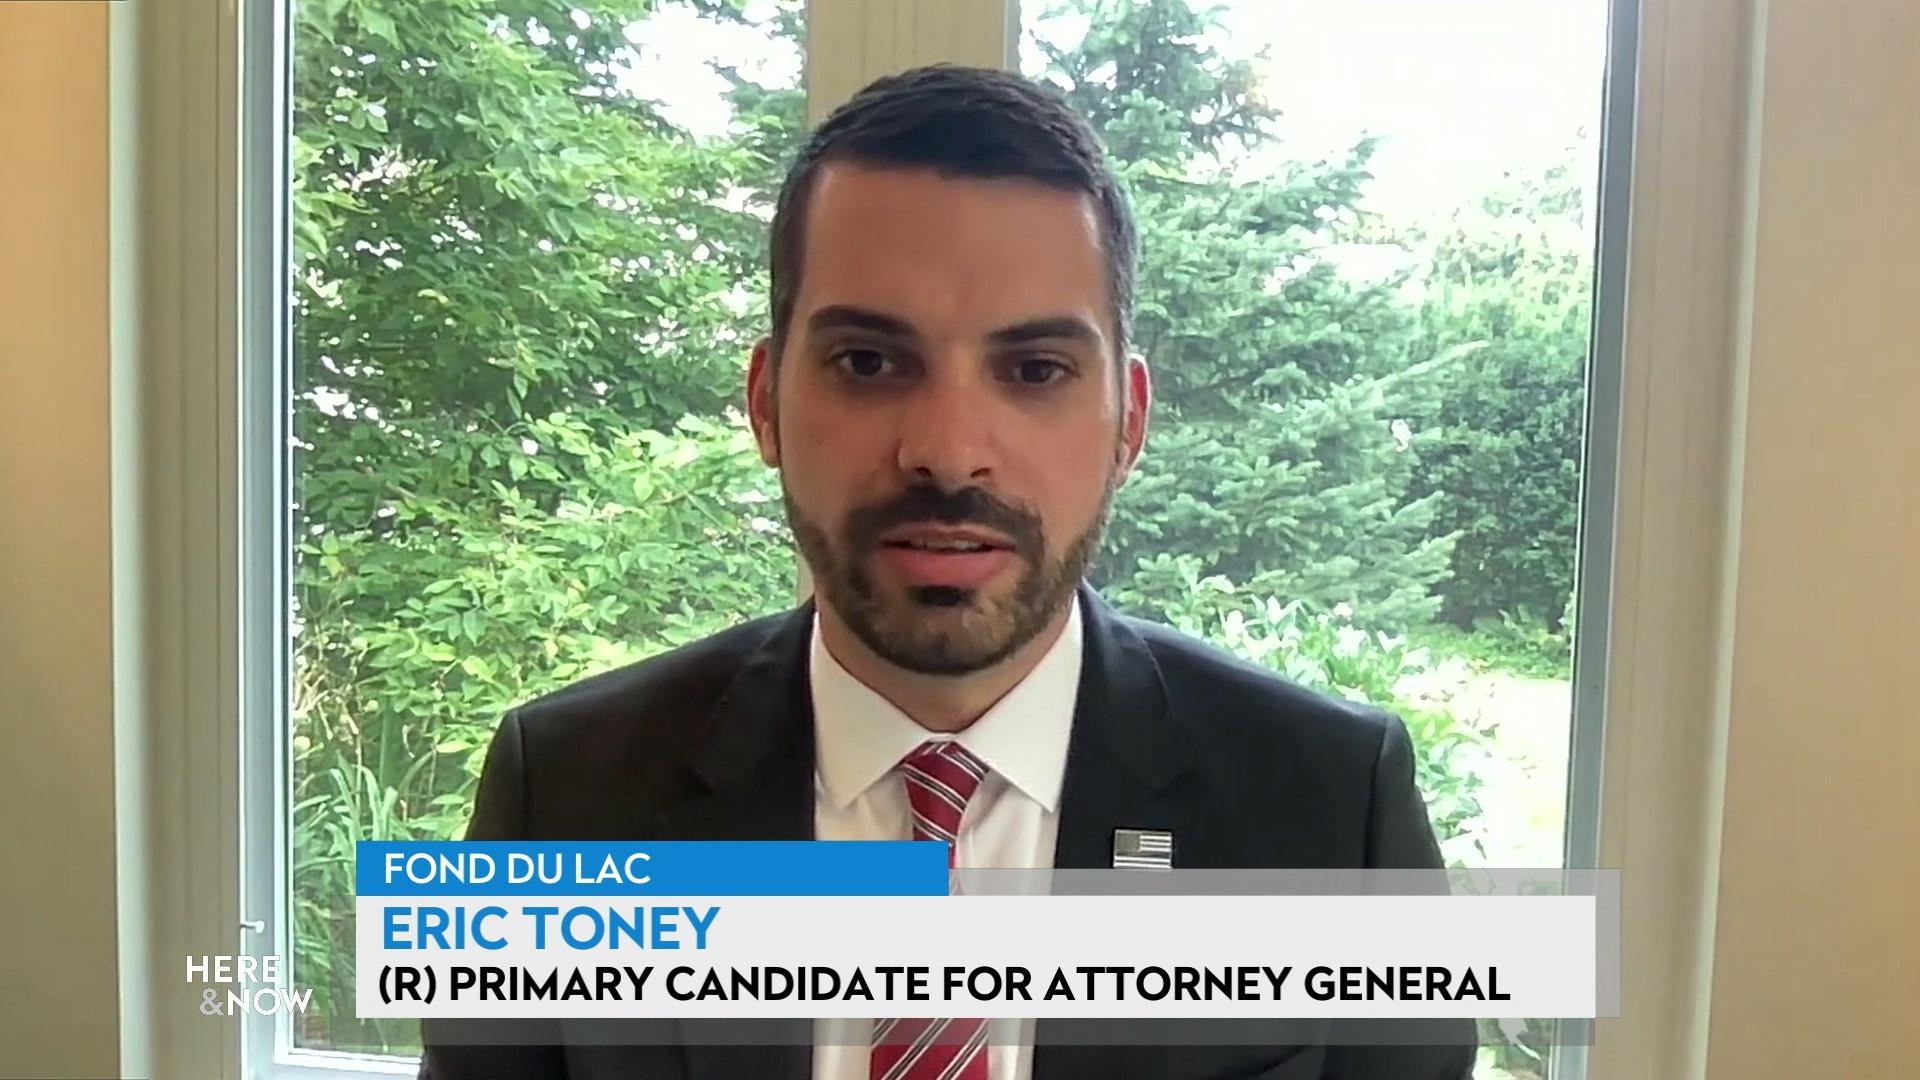 Toney on 2022 Attorney General Run